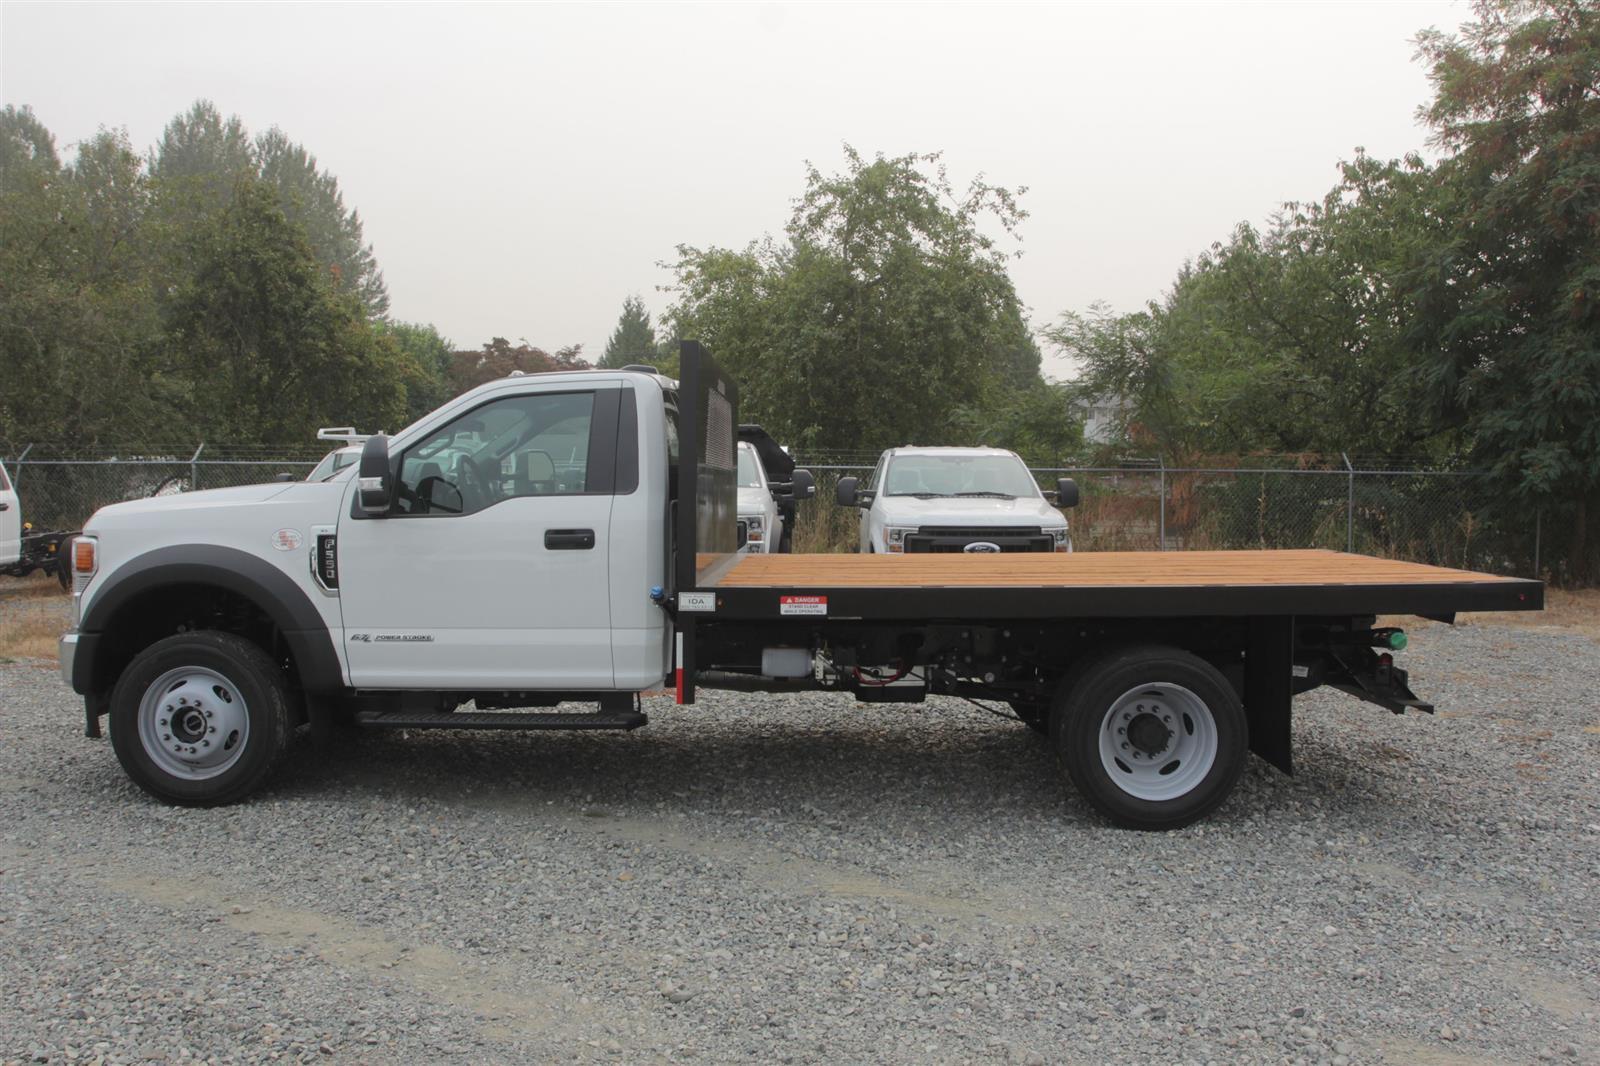 2020 Ford F-550 Regular Cab DRW 4x4, Independent Dealer Accessories Platform Body #E9263 - photo 8